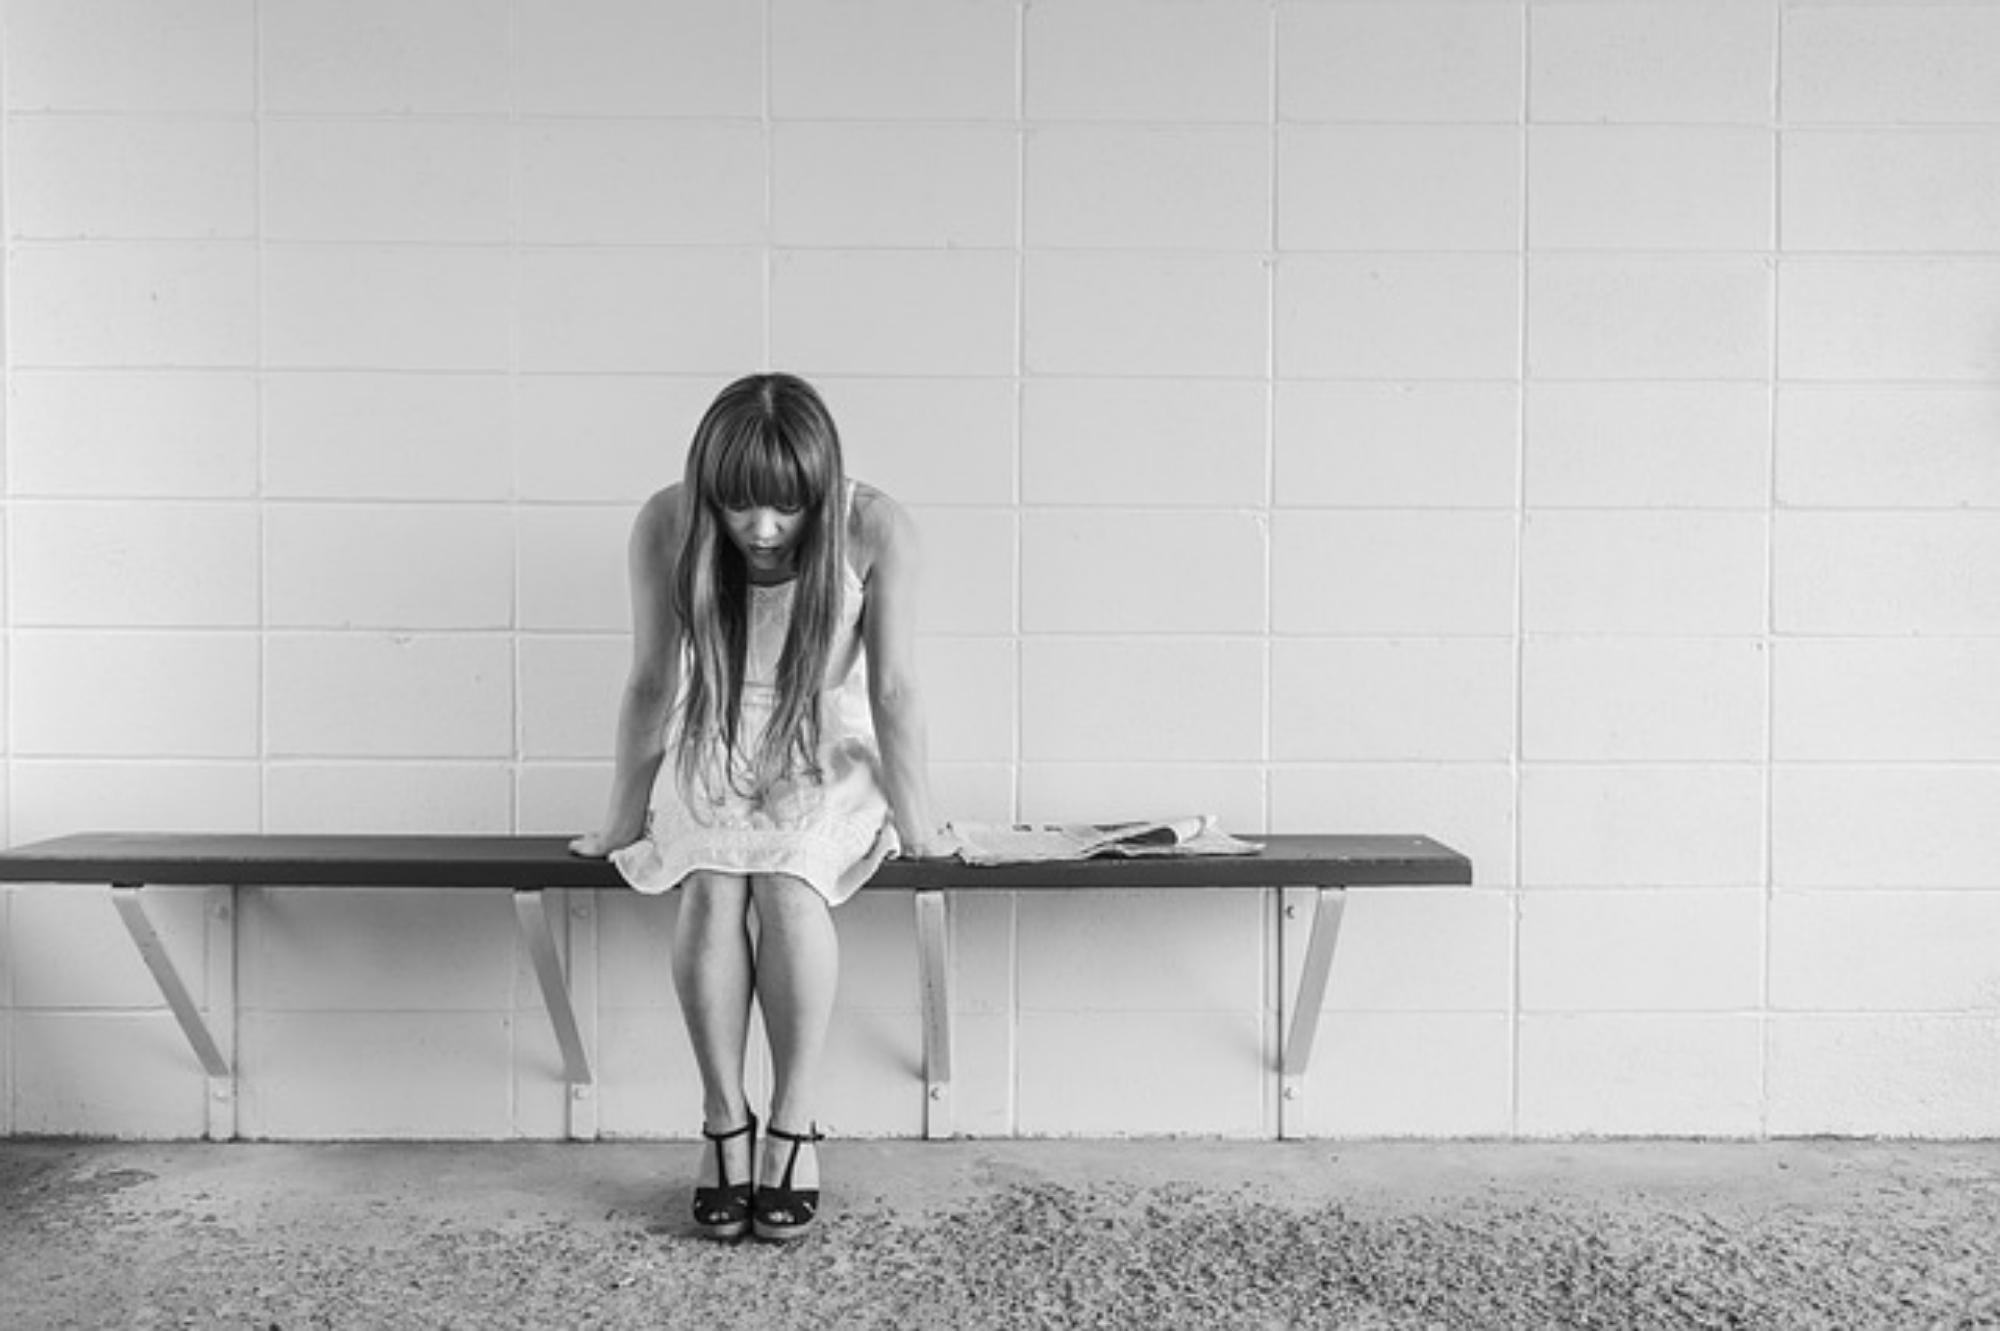 SELF HELP FOR DEPRESSION